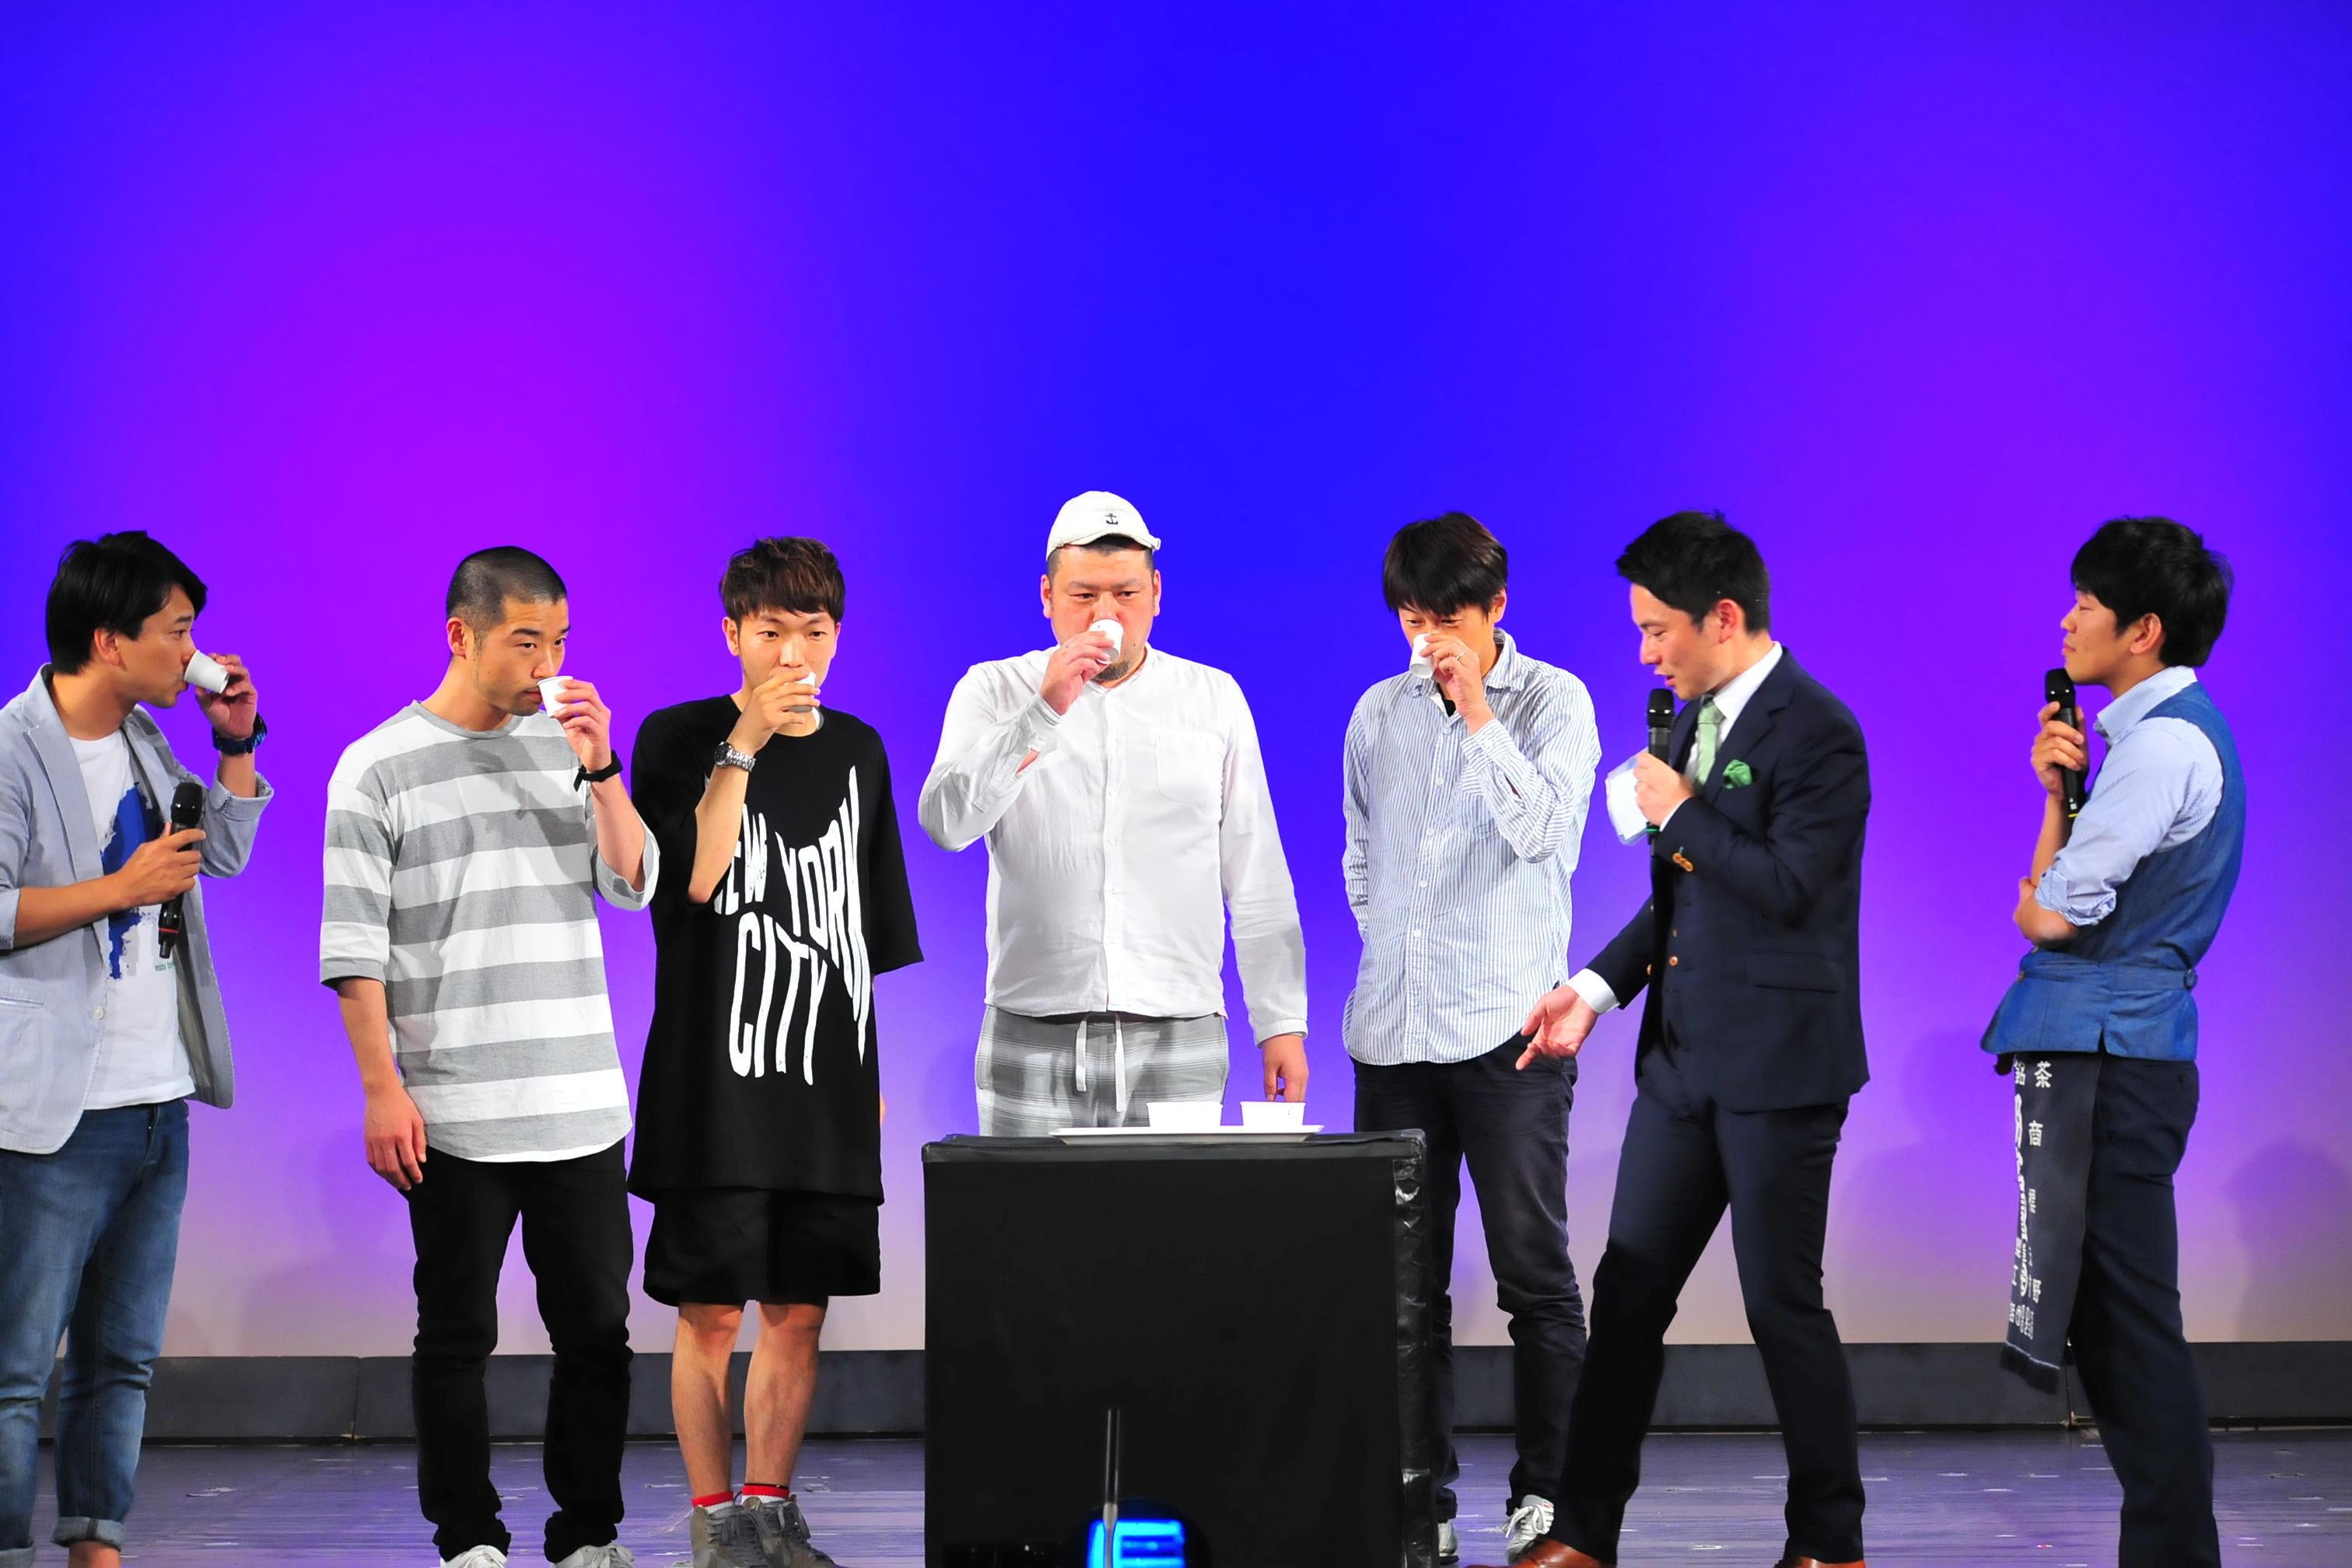 http://news.yoshimoto.co.jp/20160516144649-42763ce159942133b08ead4da2f787f8c88cdb8c.jpg